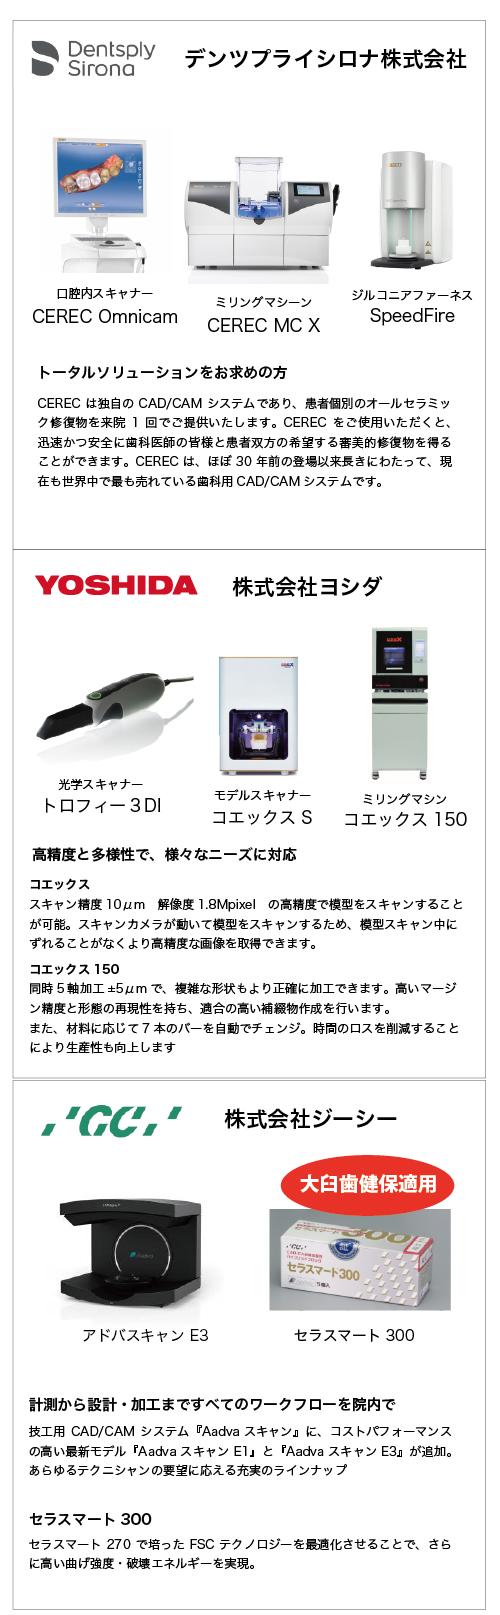 180201kanazawa_cadcam01